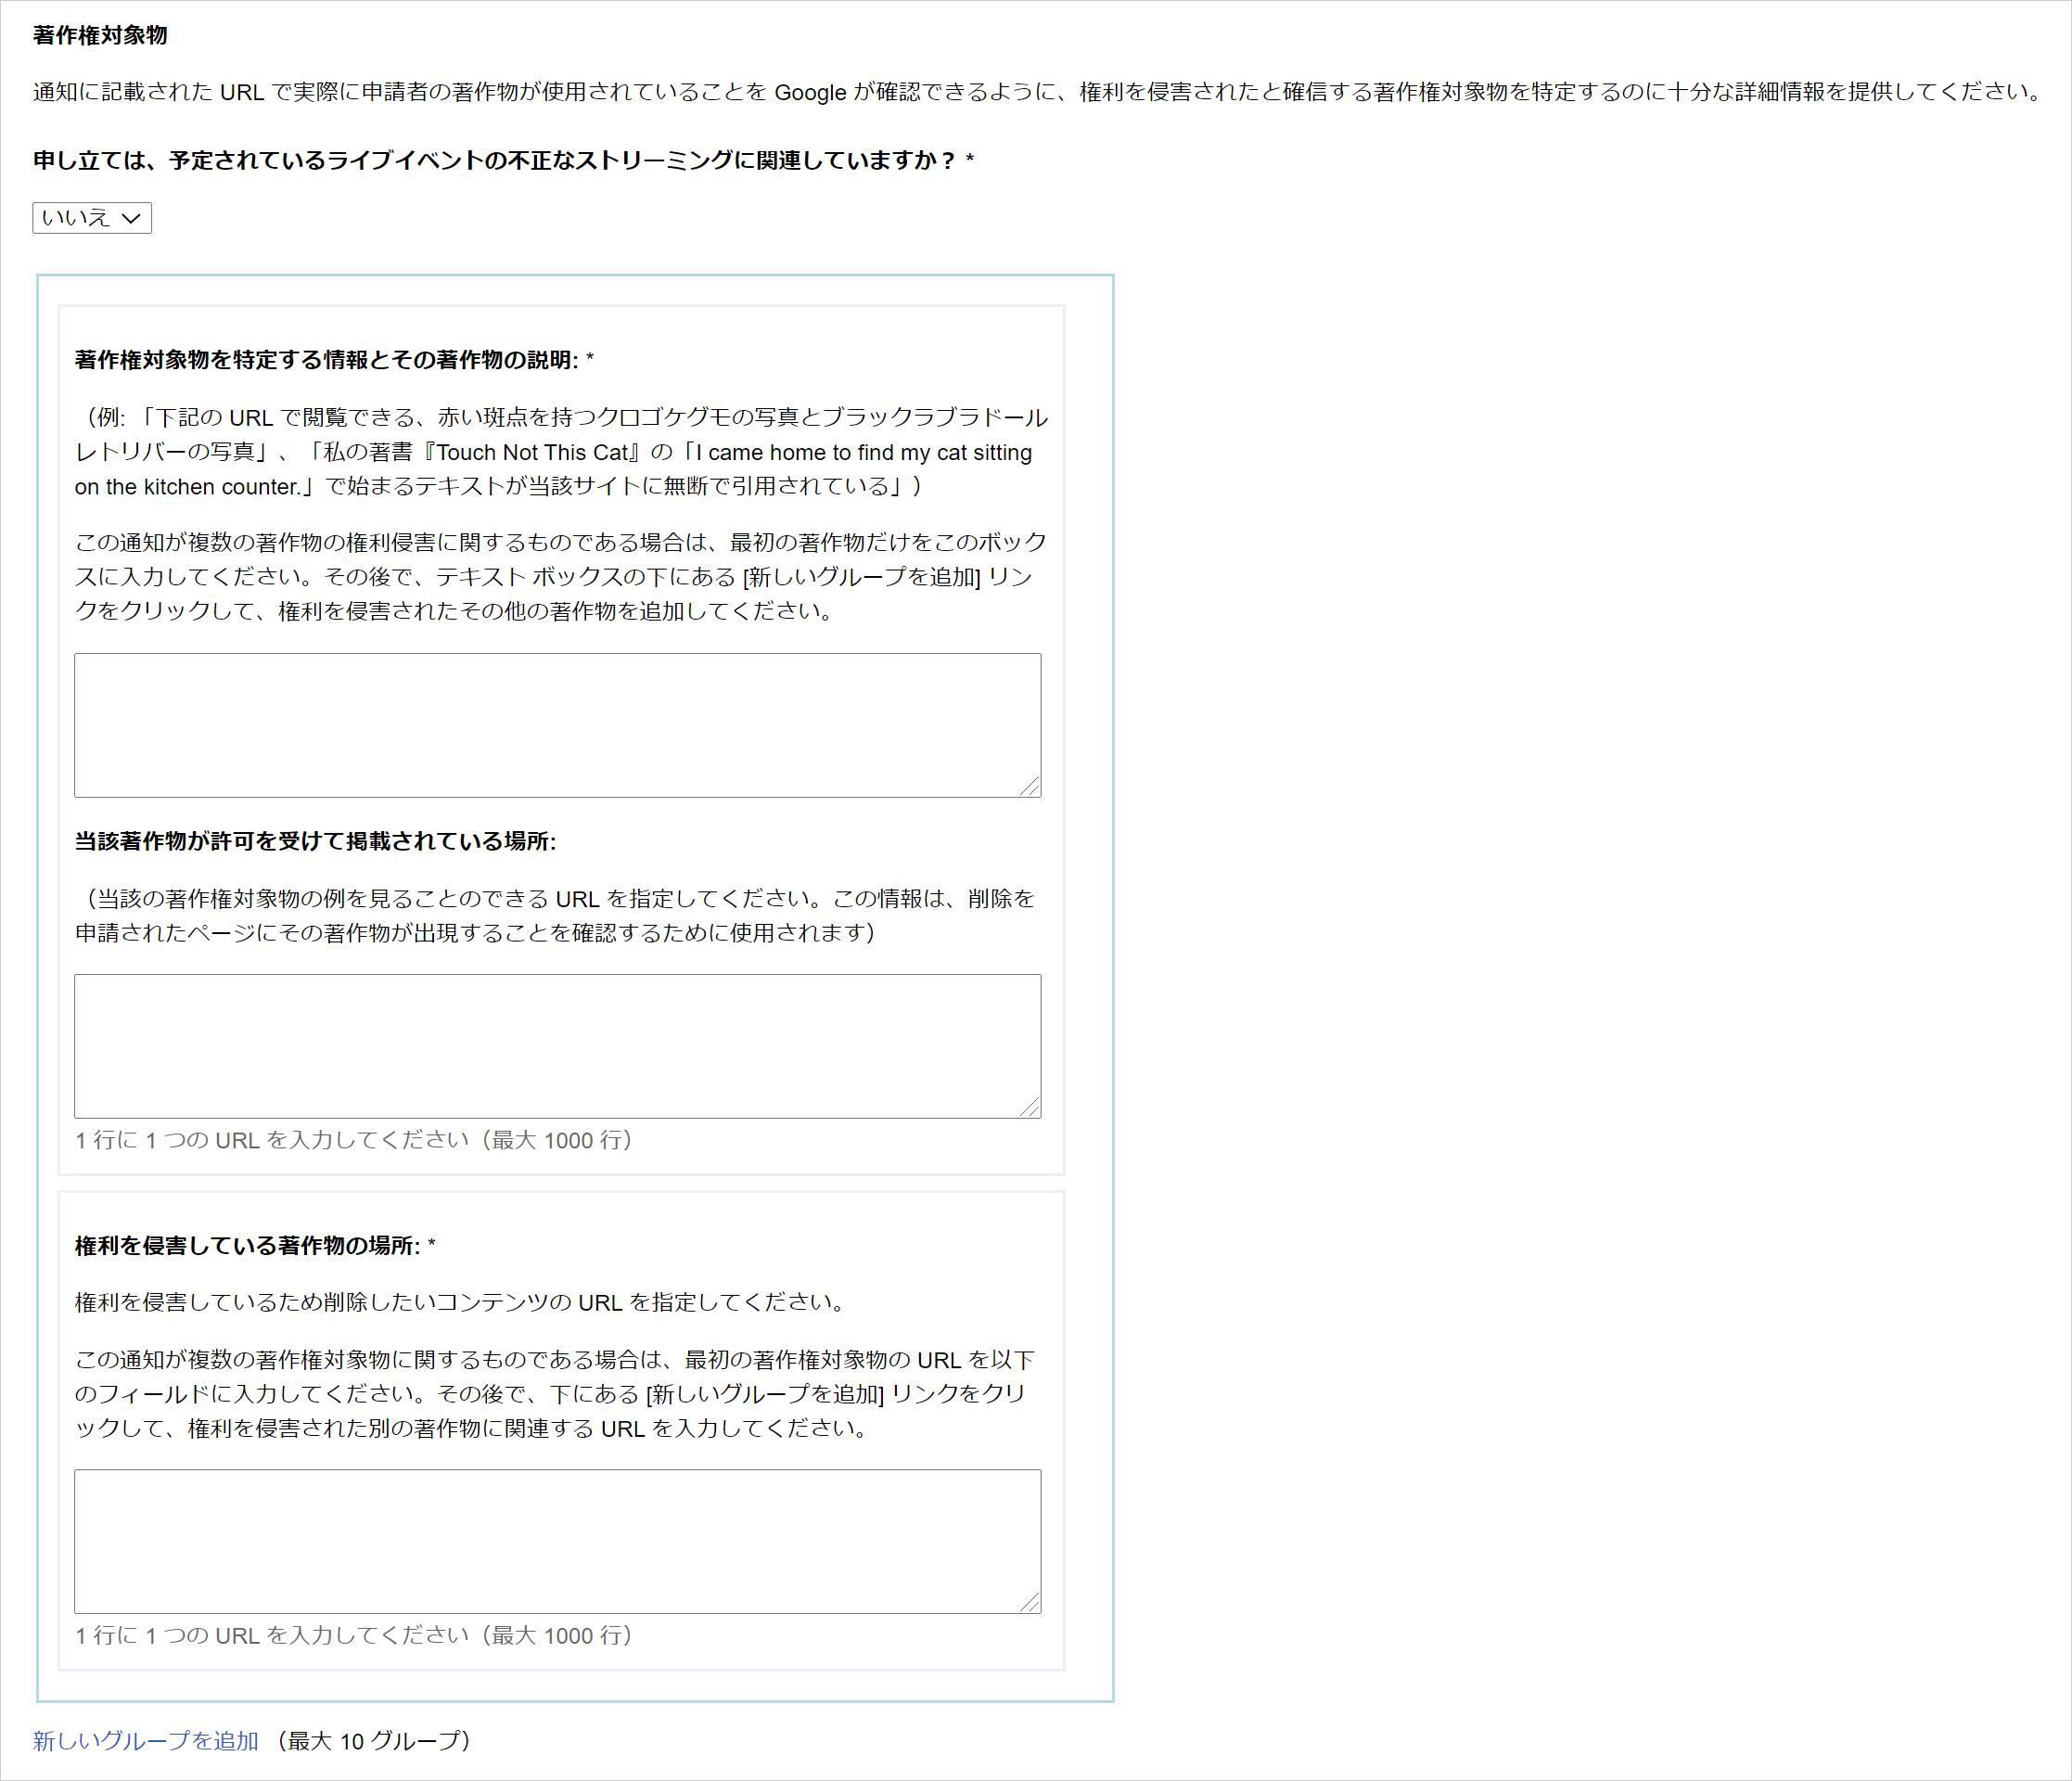 DMCA申請のために「著作権侵害の内容」を記述する